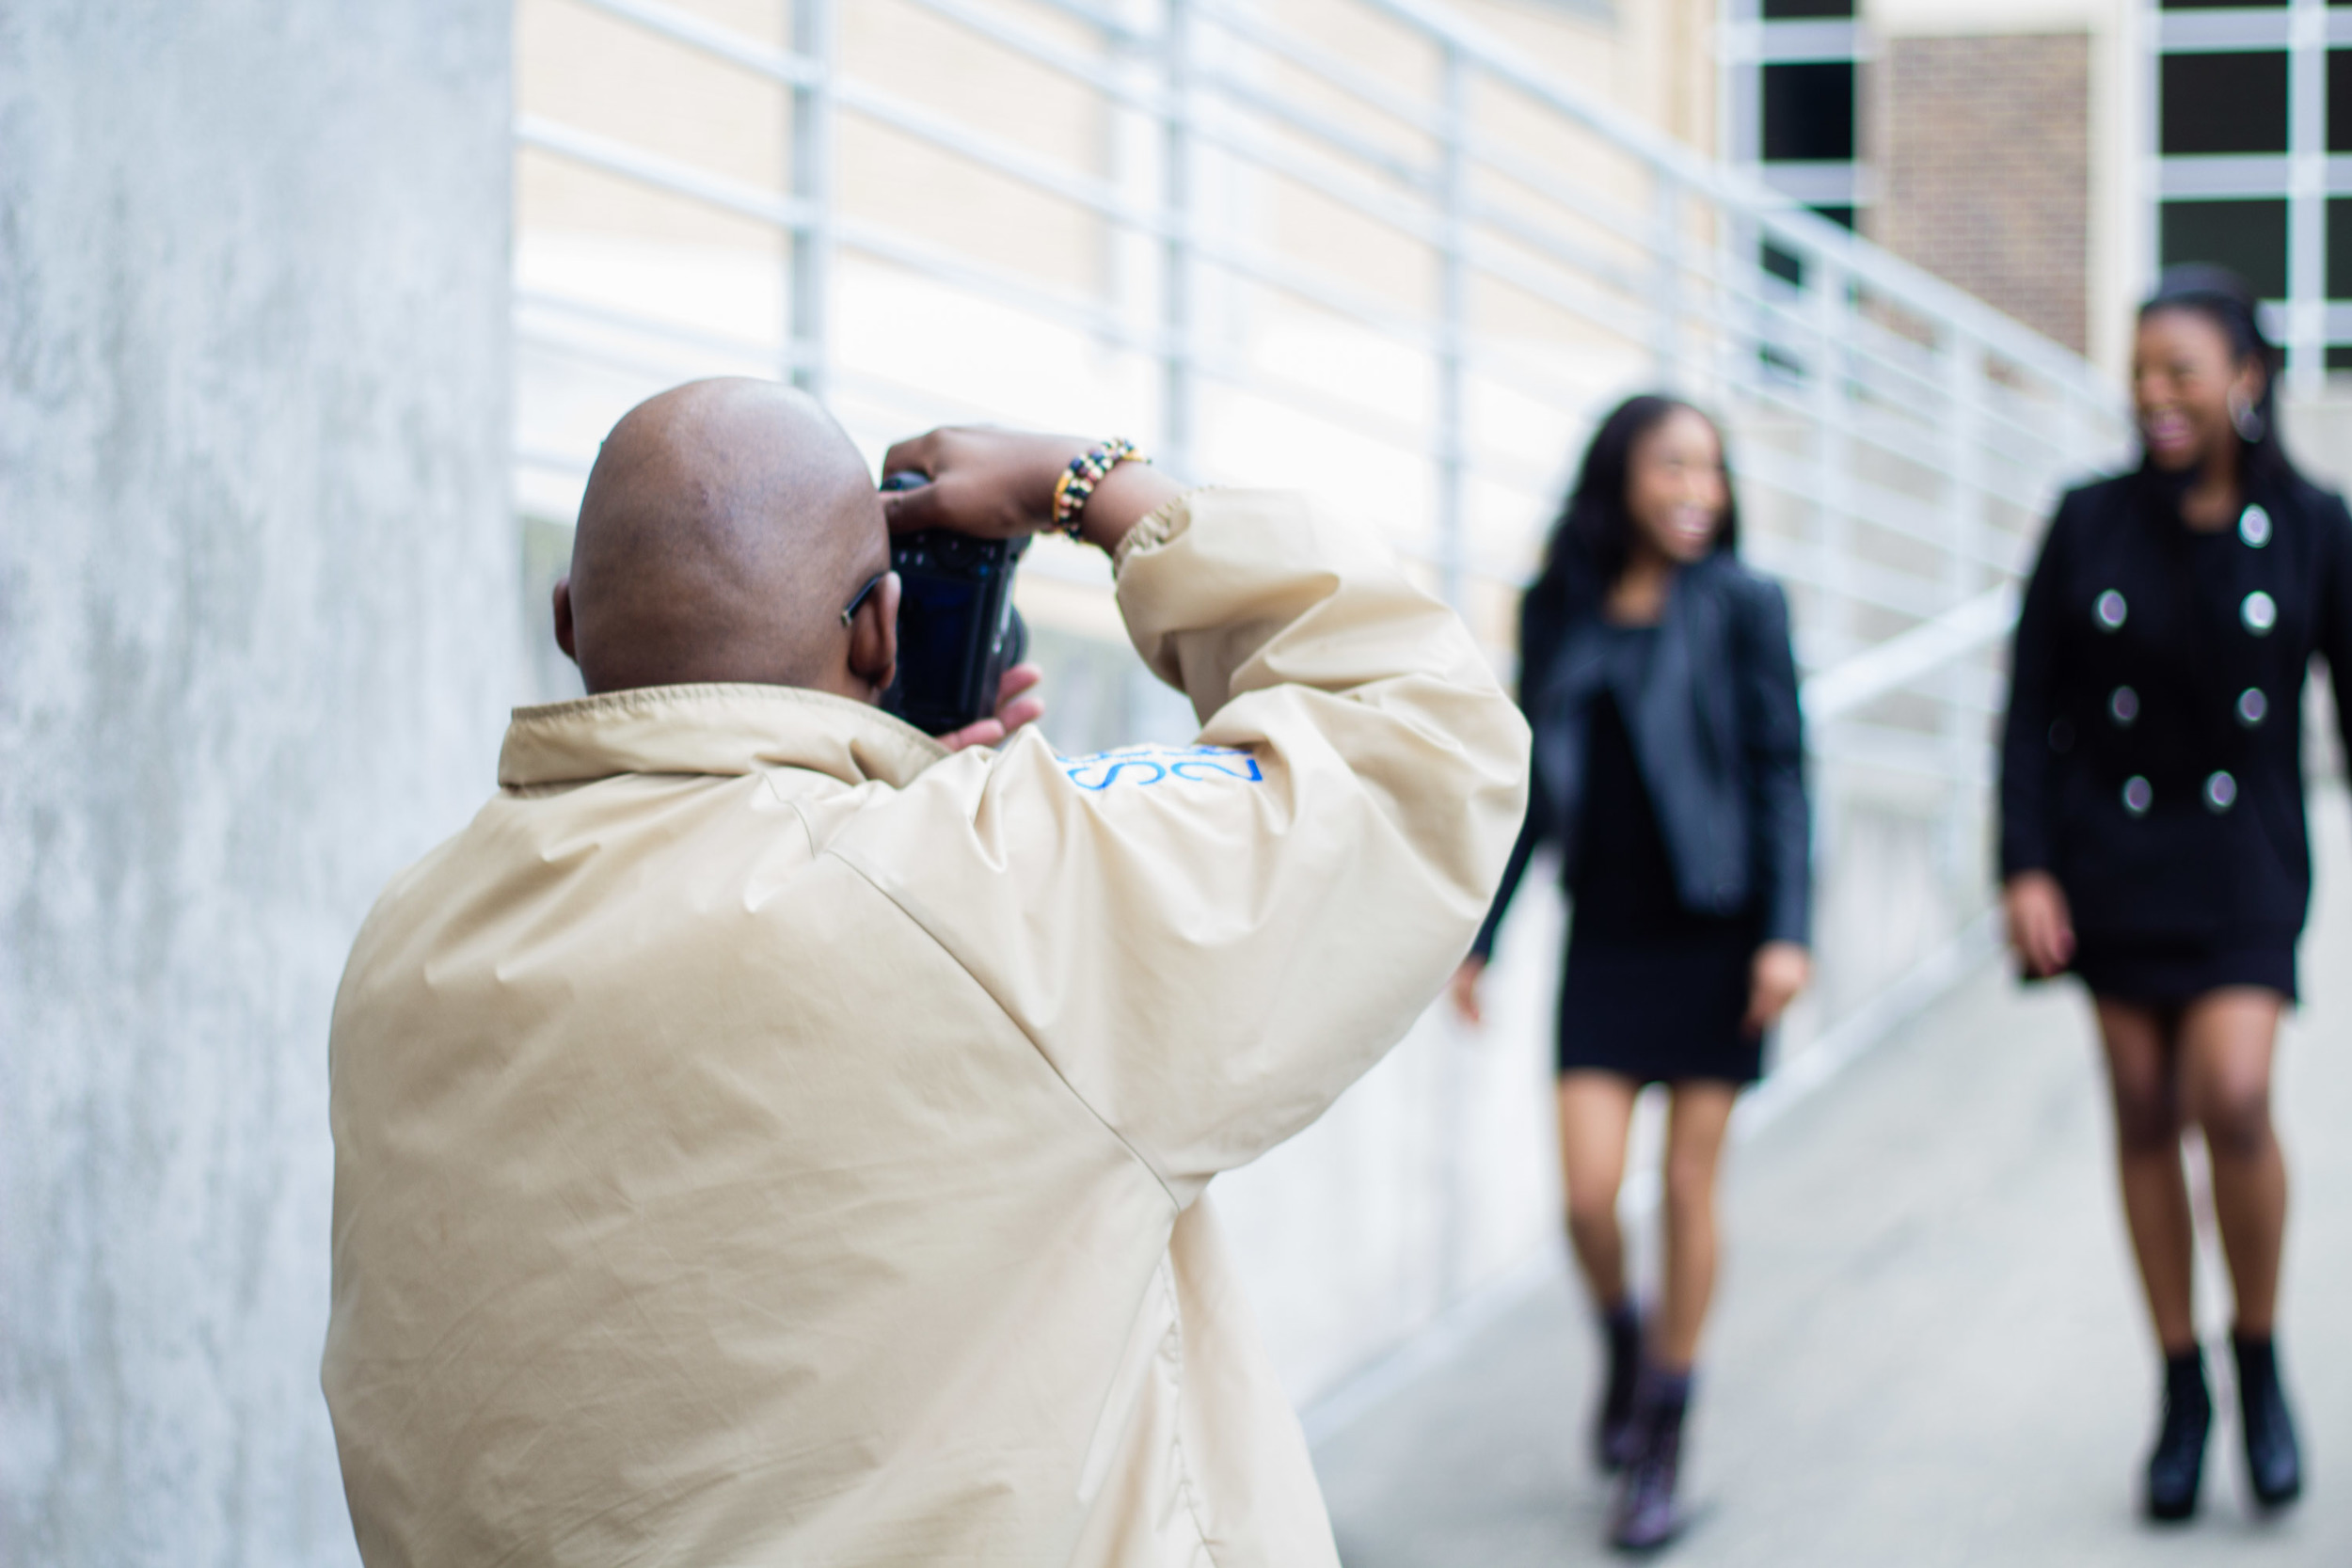 Greenville NC Photographer | Class of 2016 Senior Models | The Heist Inspired Senior Portraits | Bryant Tyson Photography